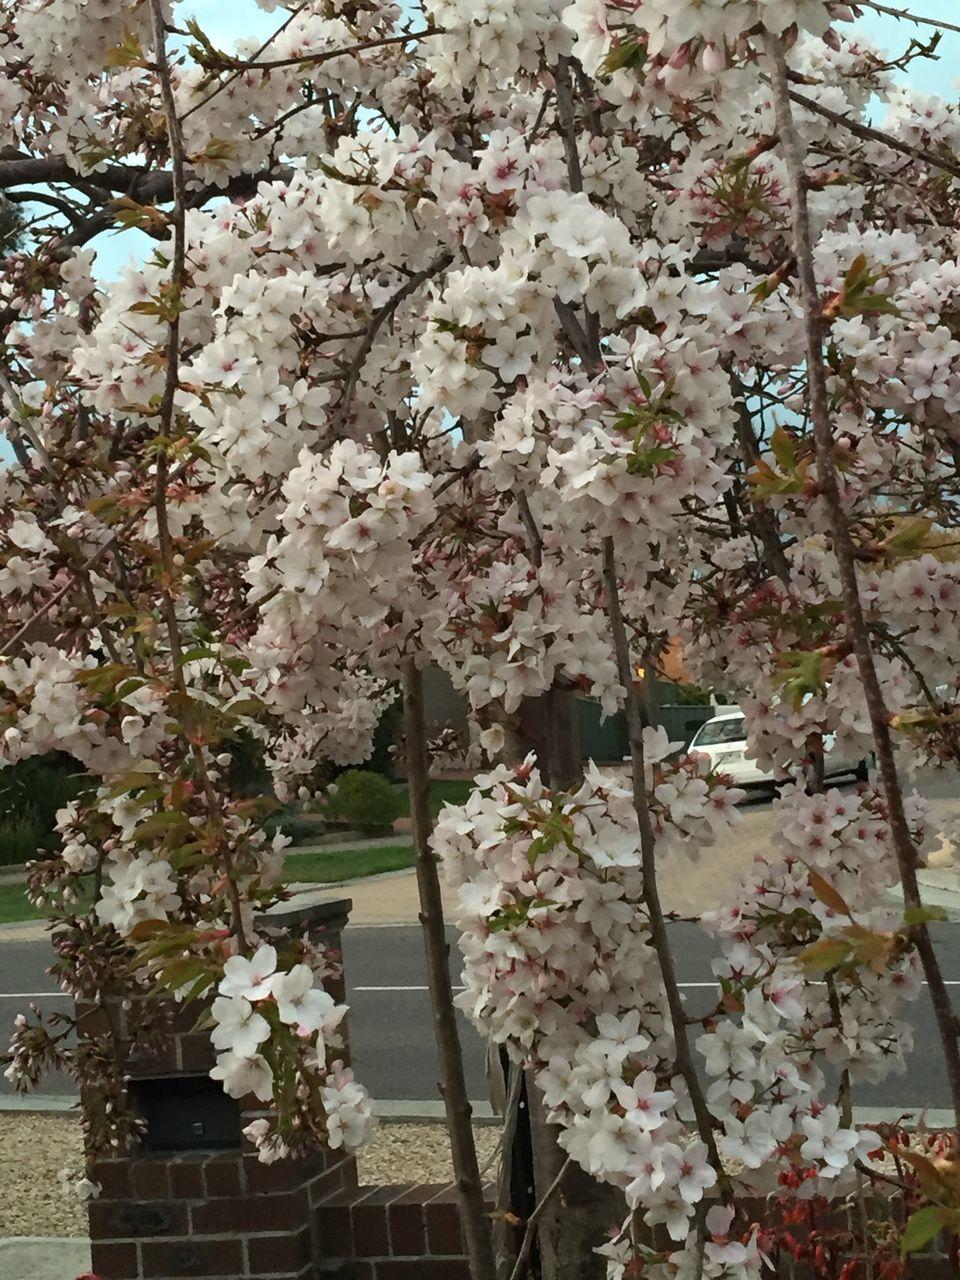 Cherry flowers blooming on tree